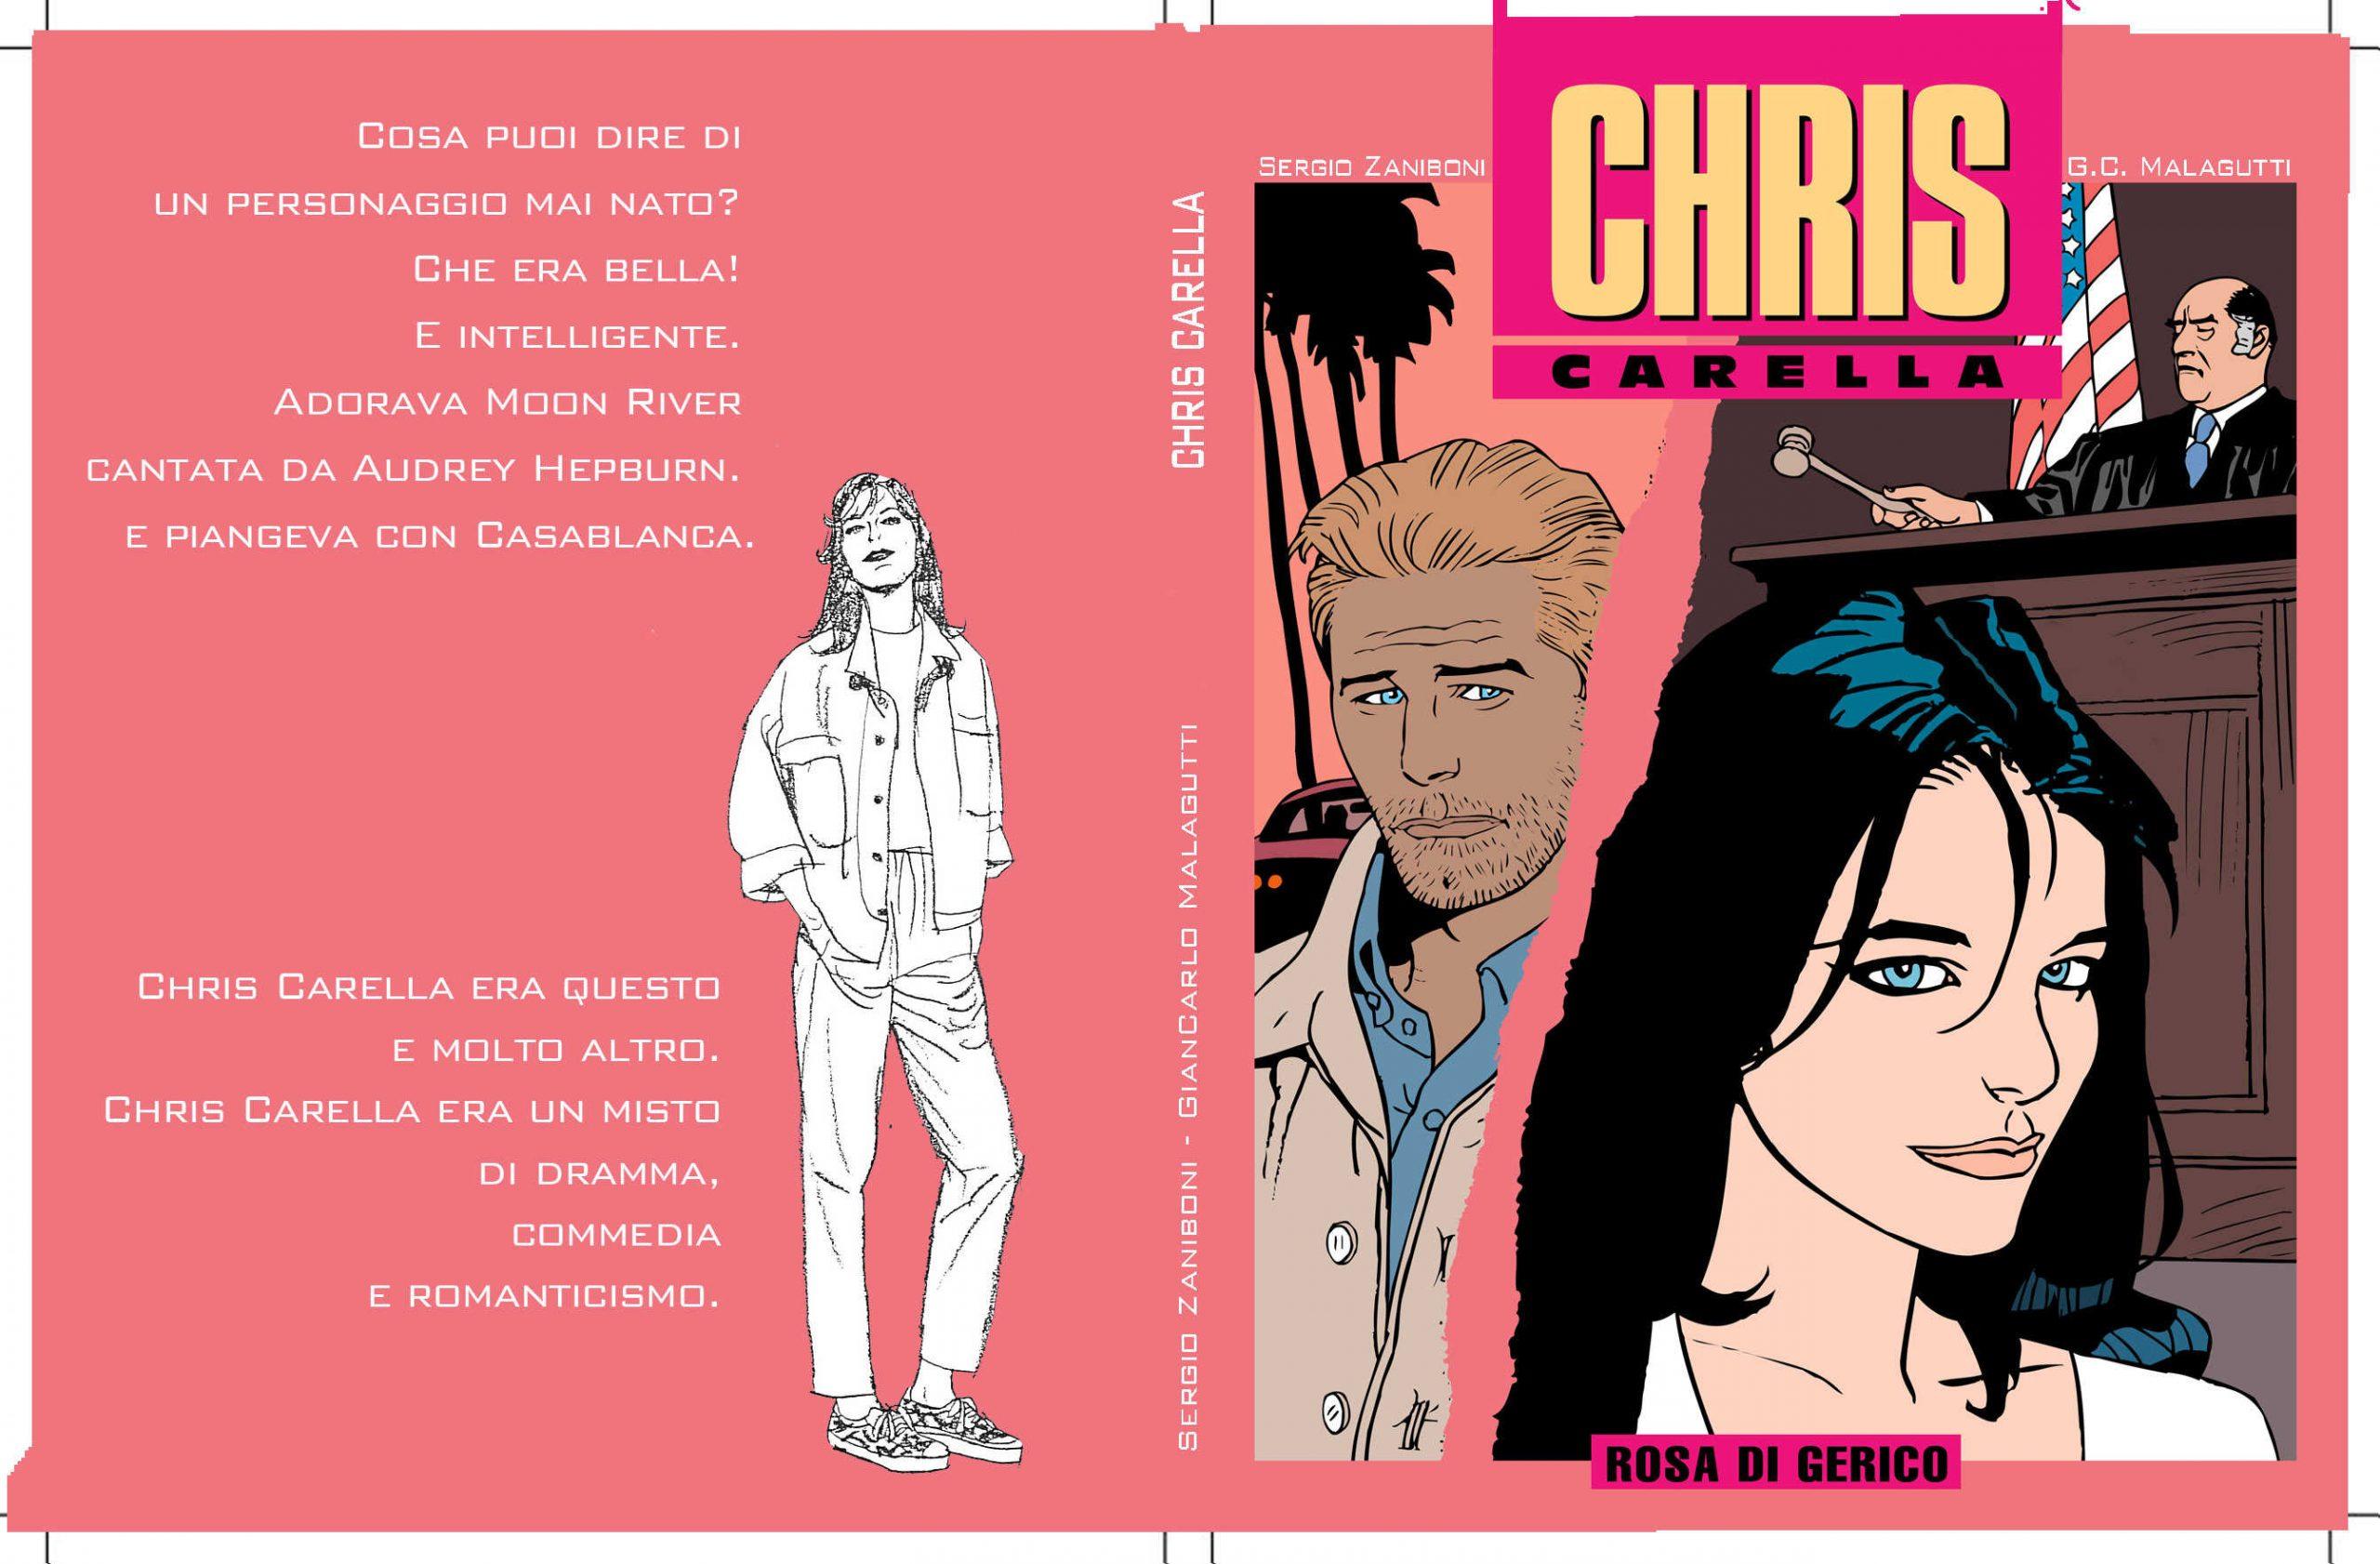 Chris Carella unpublished free comic